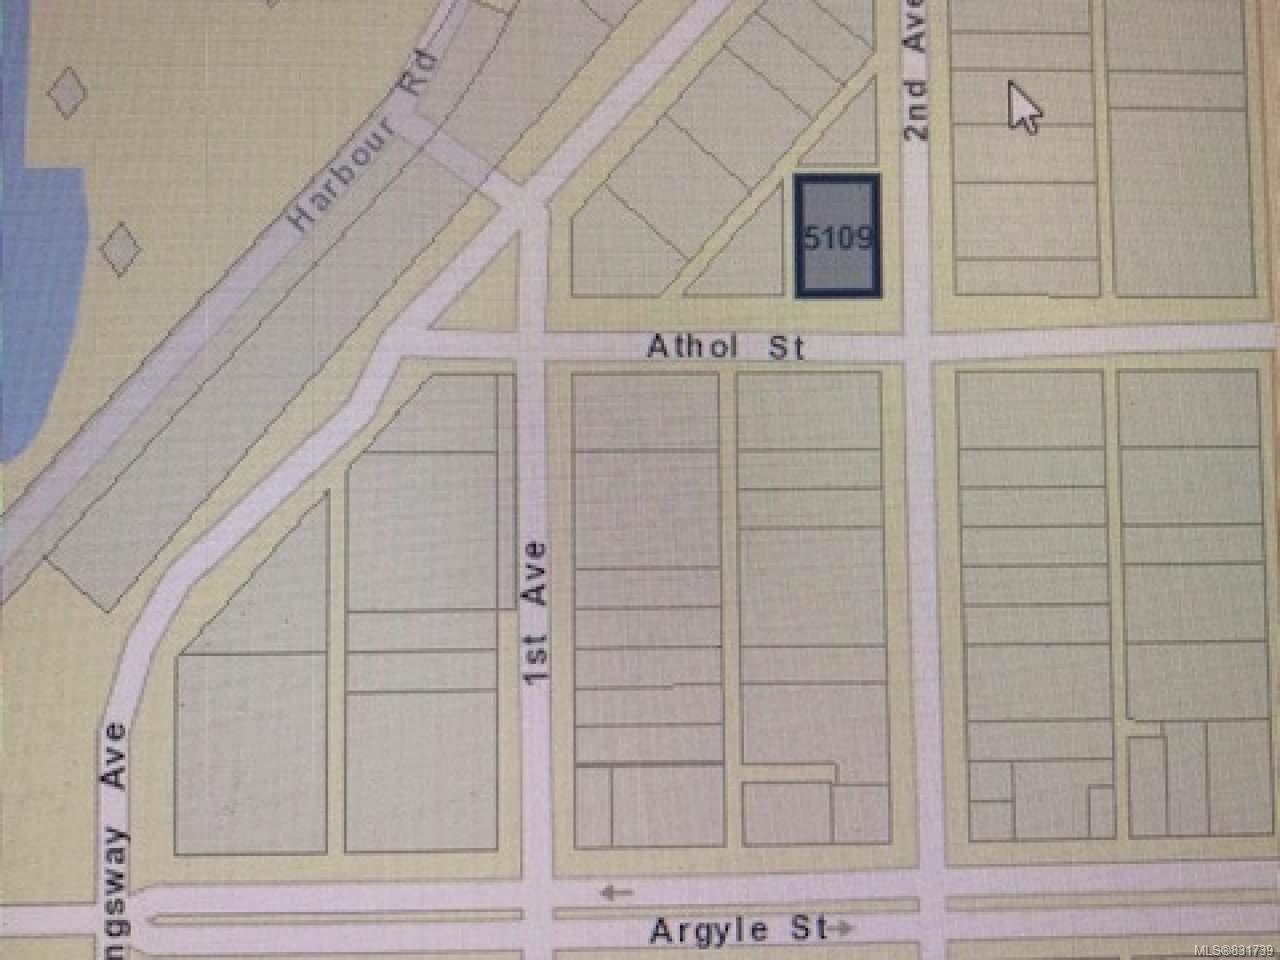 Main Photo: 5109 Athol St in PORT ALBERNI: PA Port Alberni Mixed Use for sale (Port Alberni)  : MLS®# 831739